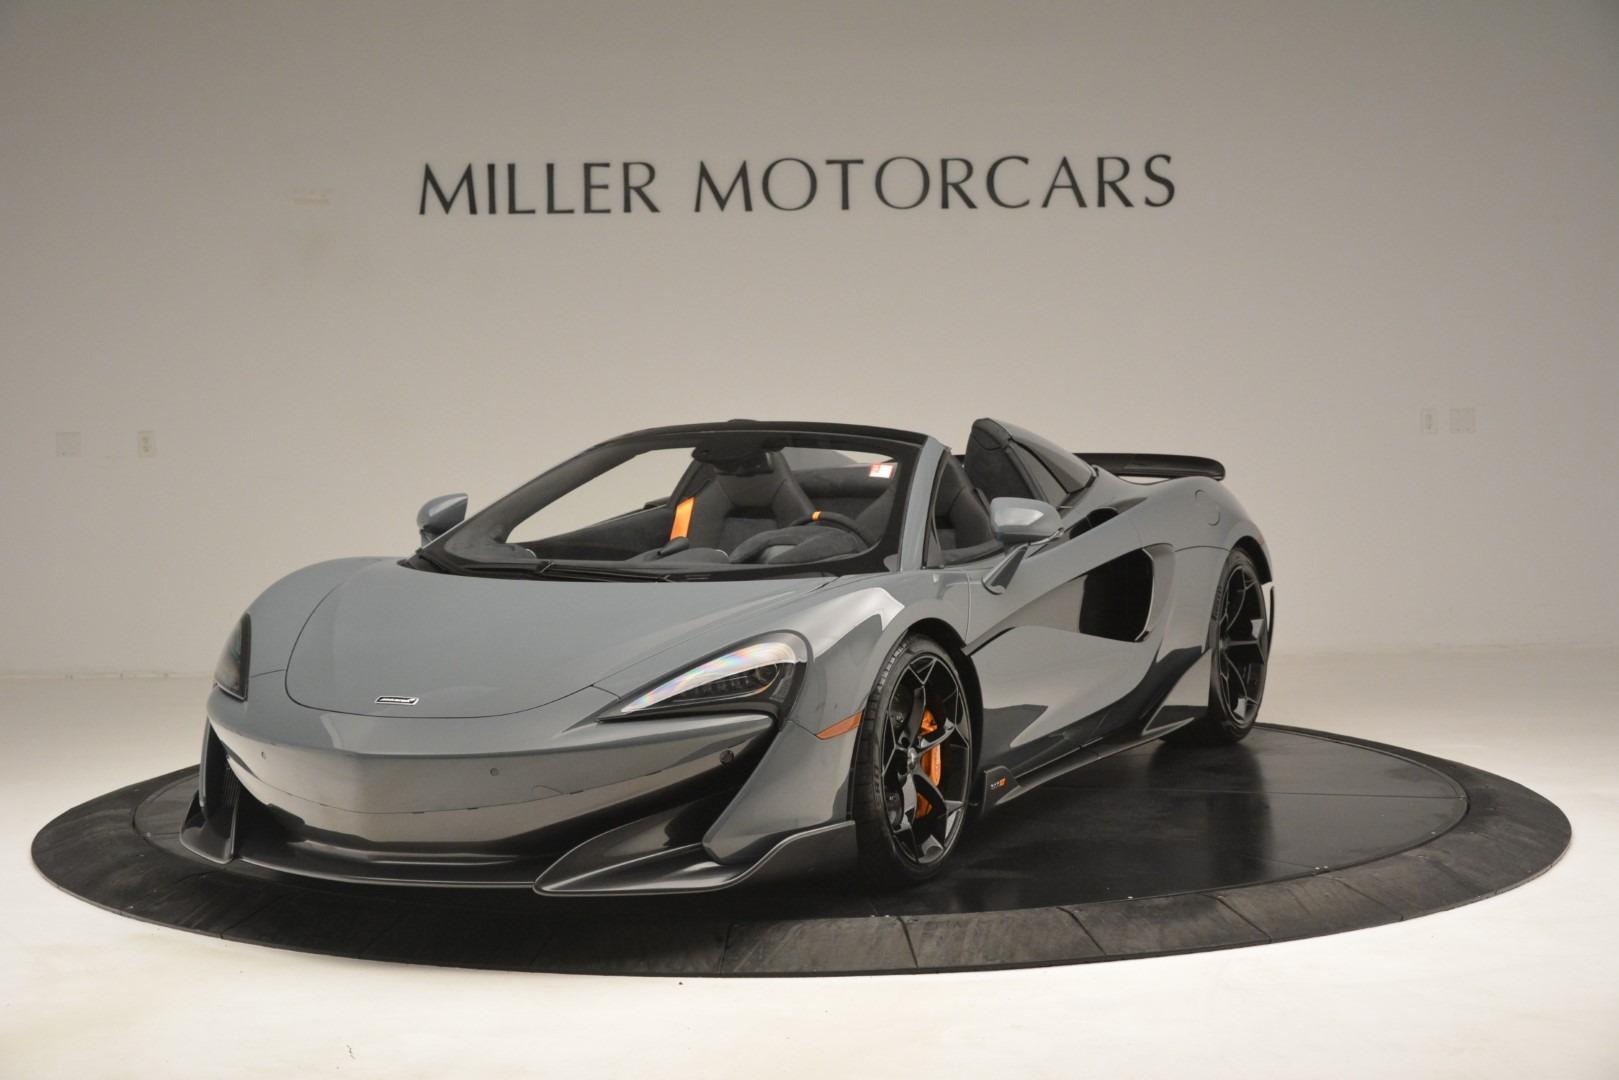 New 2020 McLaren 600LT Spider Convertible for sale Sold at McLaren Greenwich in Greenwich CT 06830 1